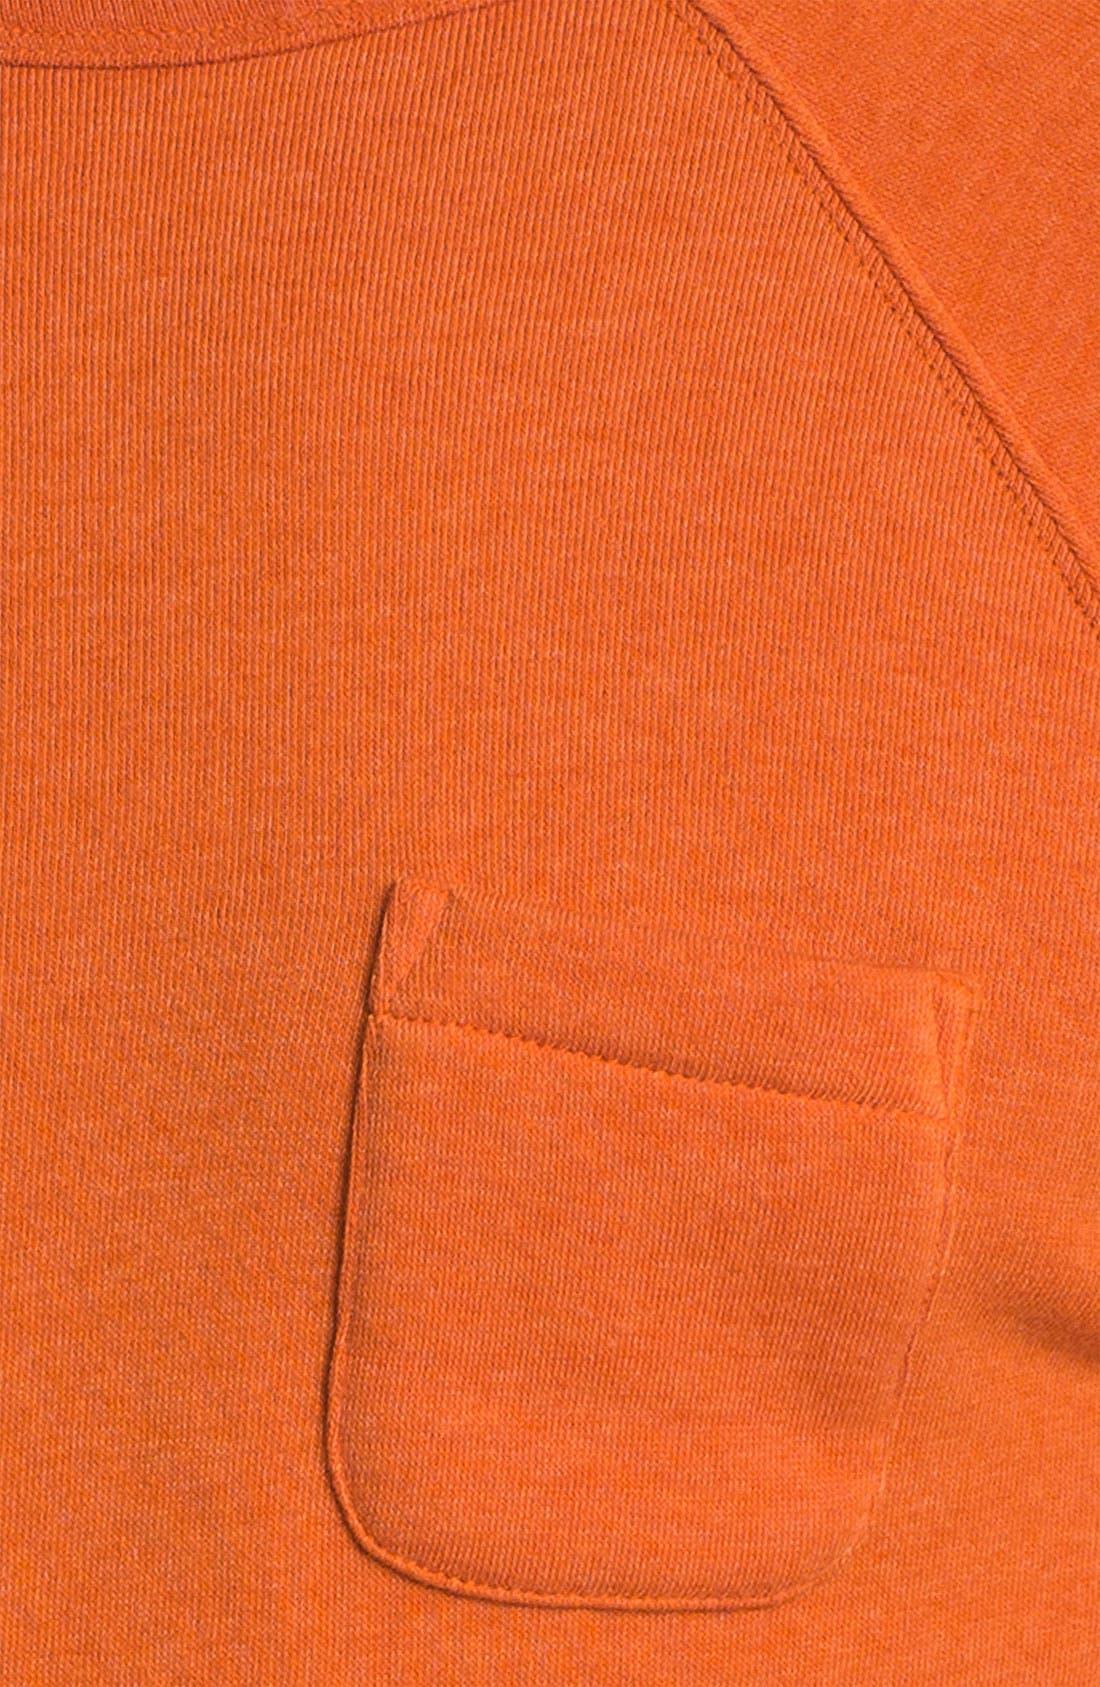 Lofty Creature Comforts Crewneck Sweatshirt,                             Alternate thumbnail 3, color,                             Apricot